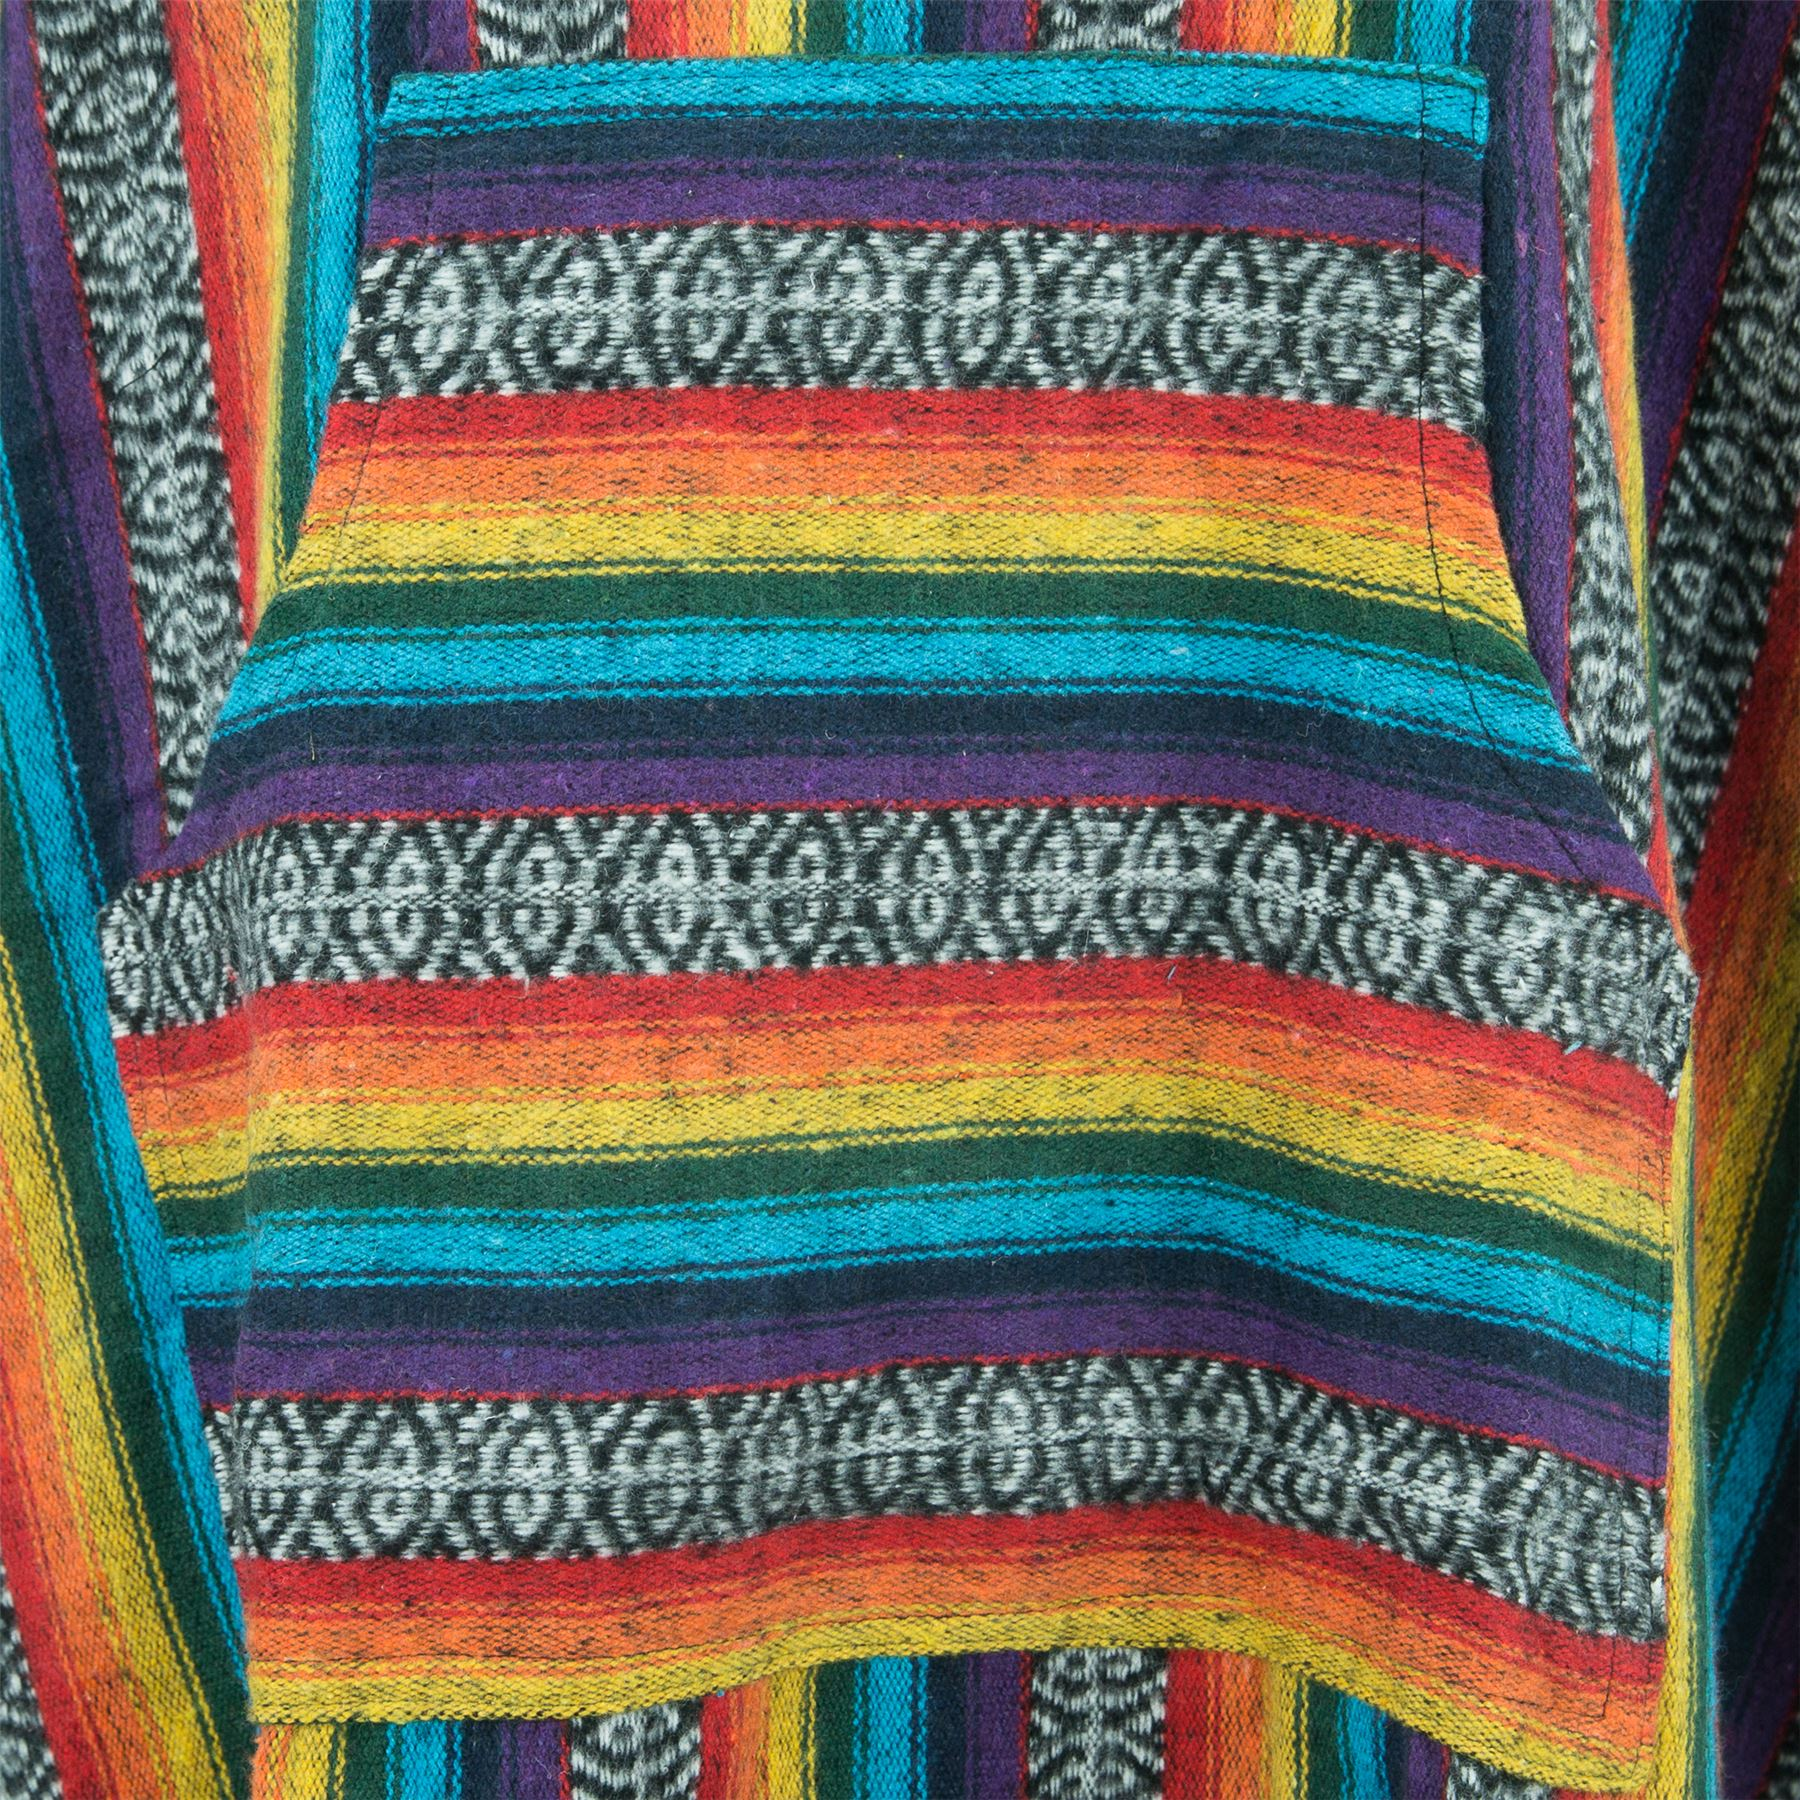 Poncho-Hooded-Cape-Cotton-Warm-Festival-Long-Woven-Rainbow-Men-Women thumbnail 17